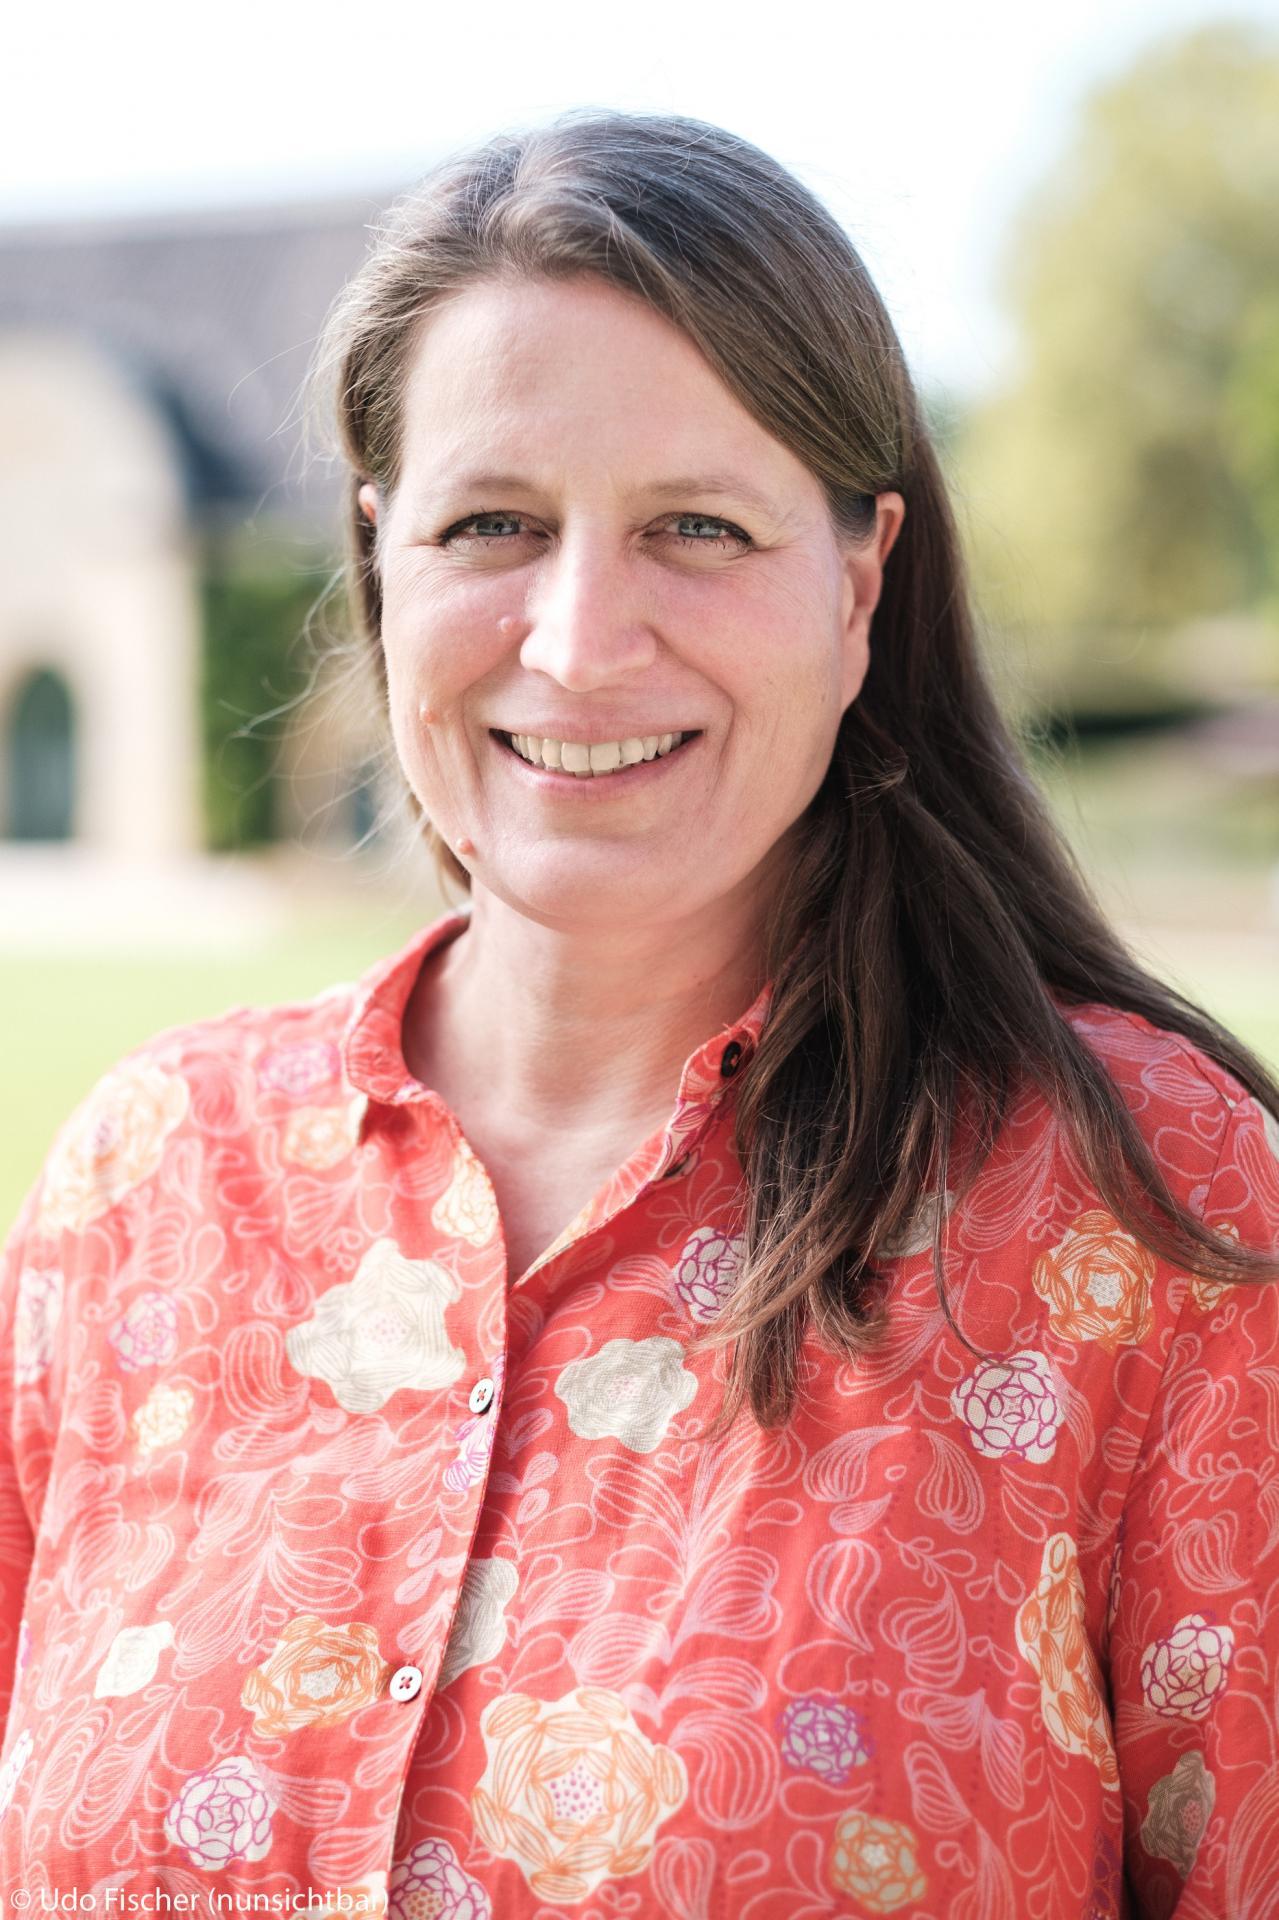 Dr. Annette Paetz gen. Schieck